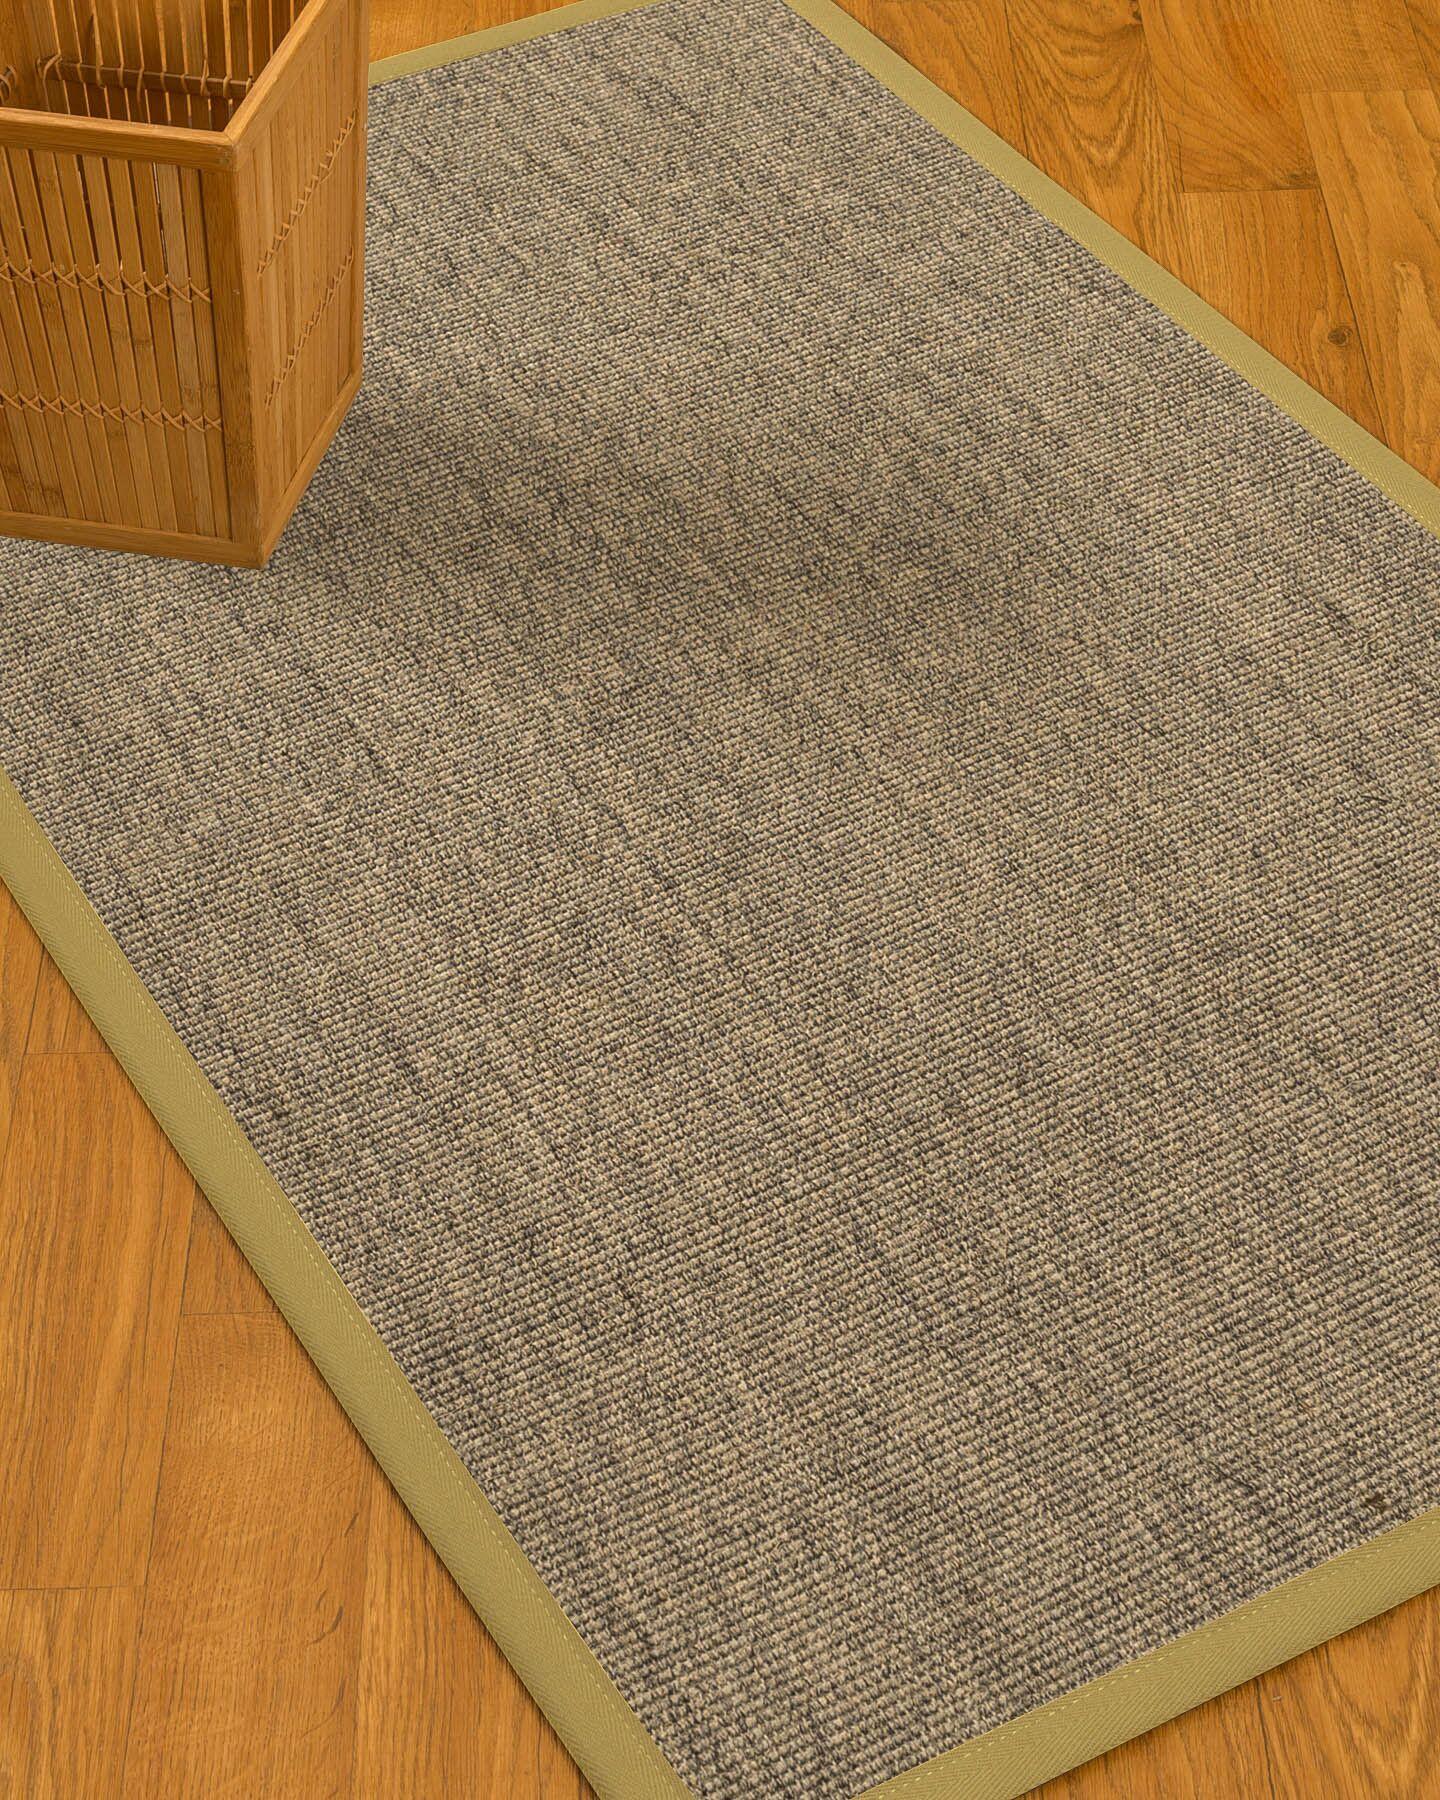 Mahan Border Hand-Woven Gray/Sand Area Rug Rug Size: Rectangle 8' x 10', Rug Pad Included: Yes